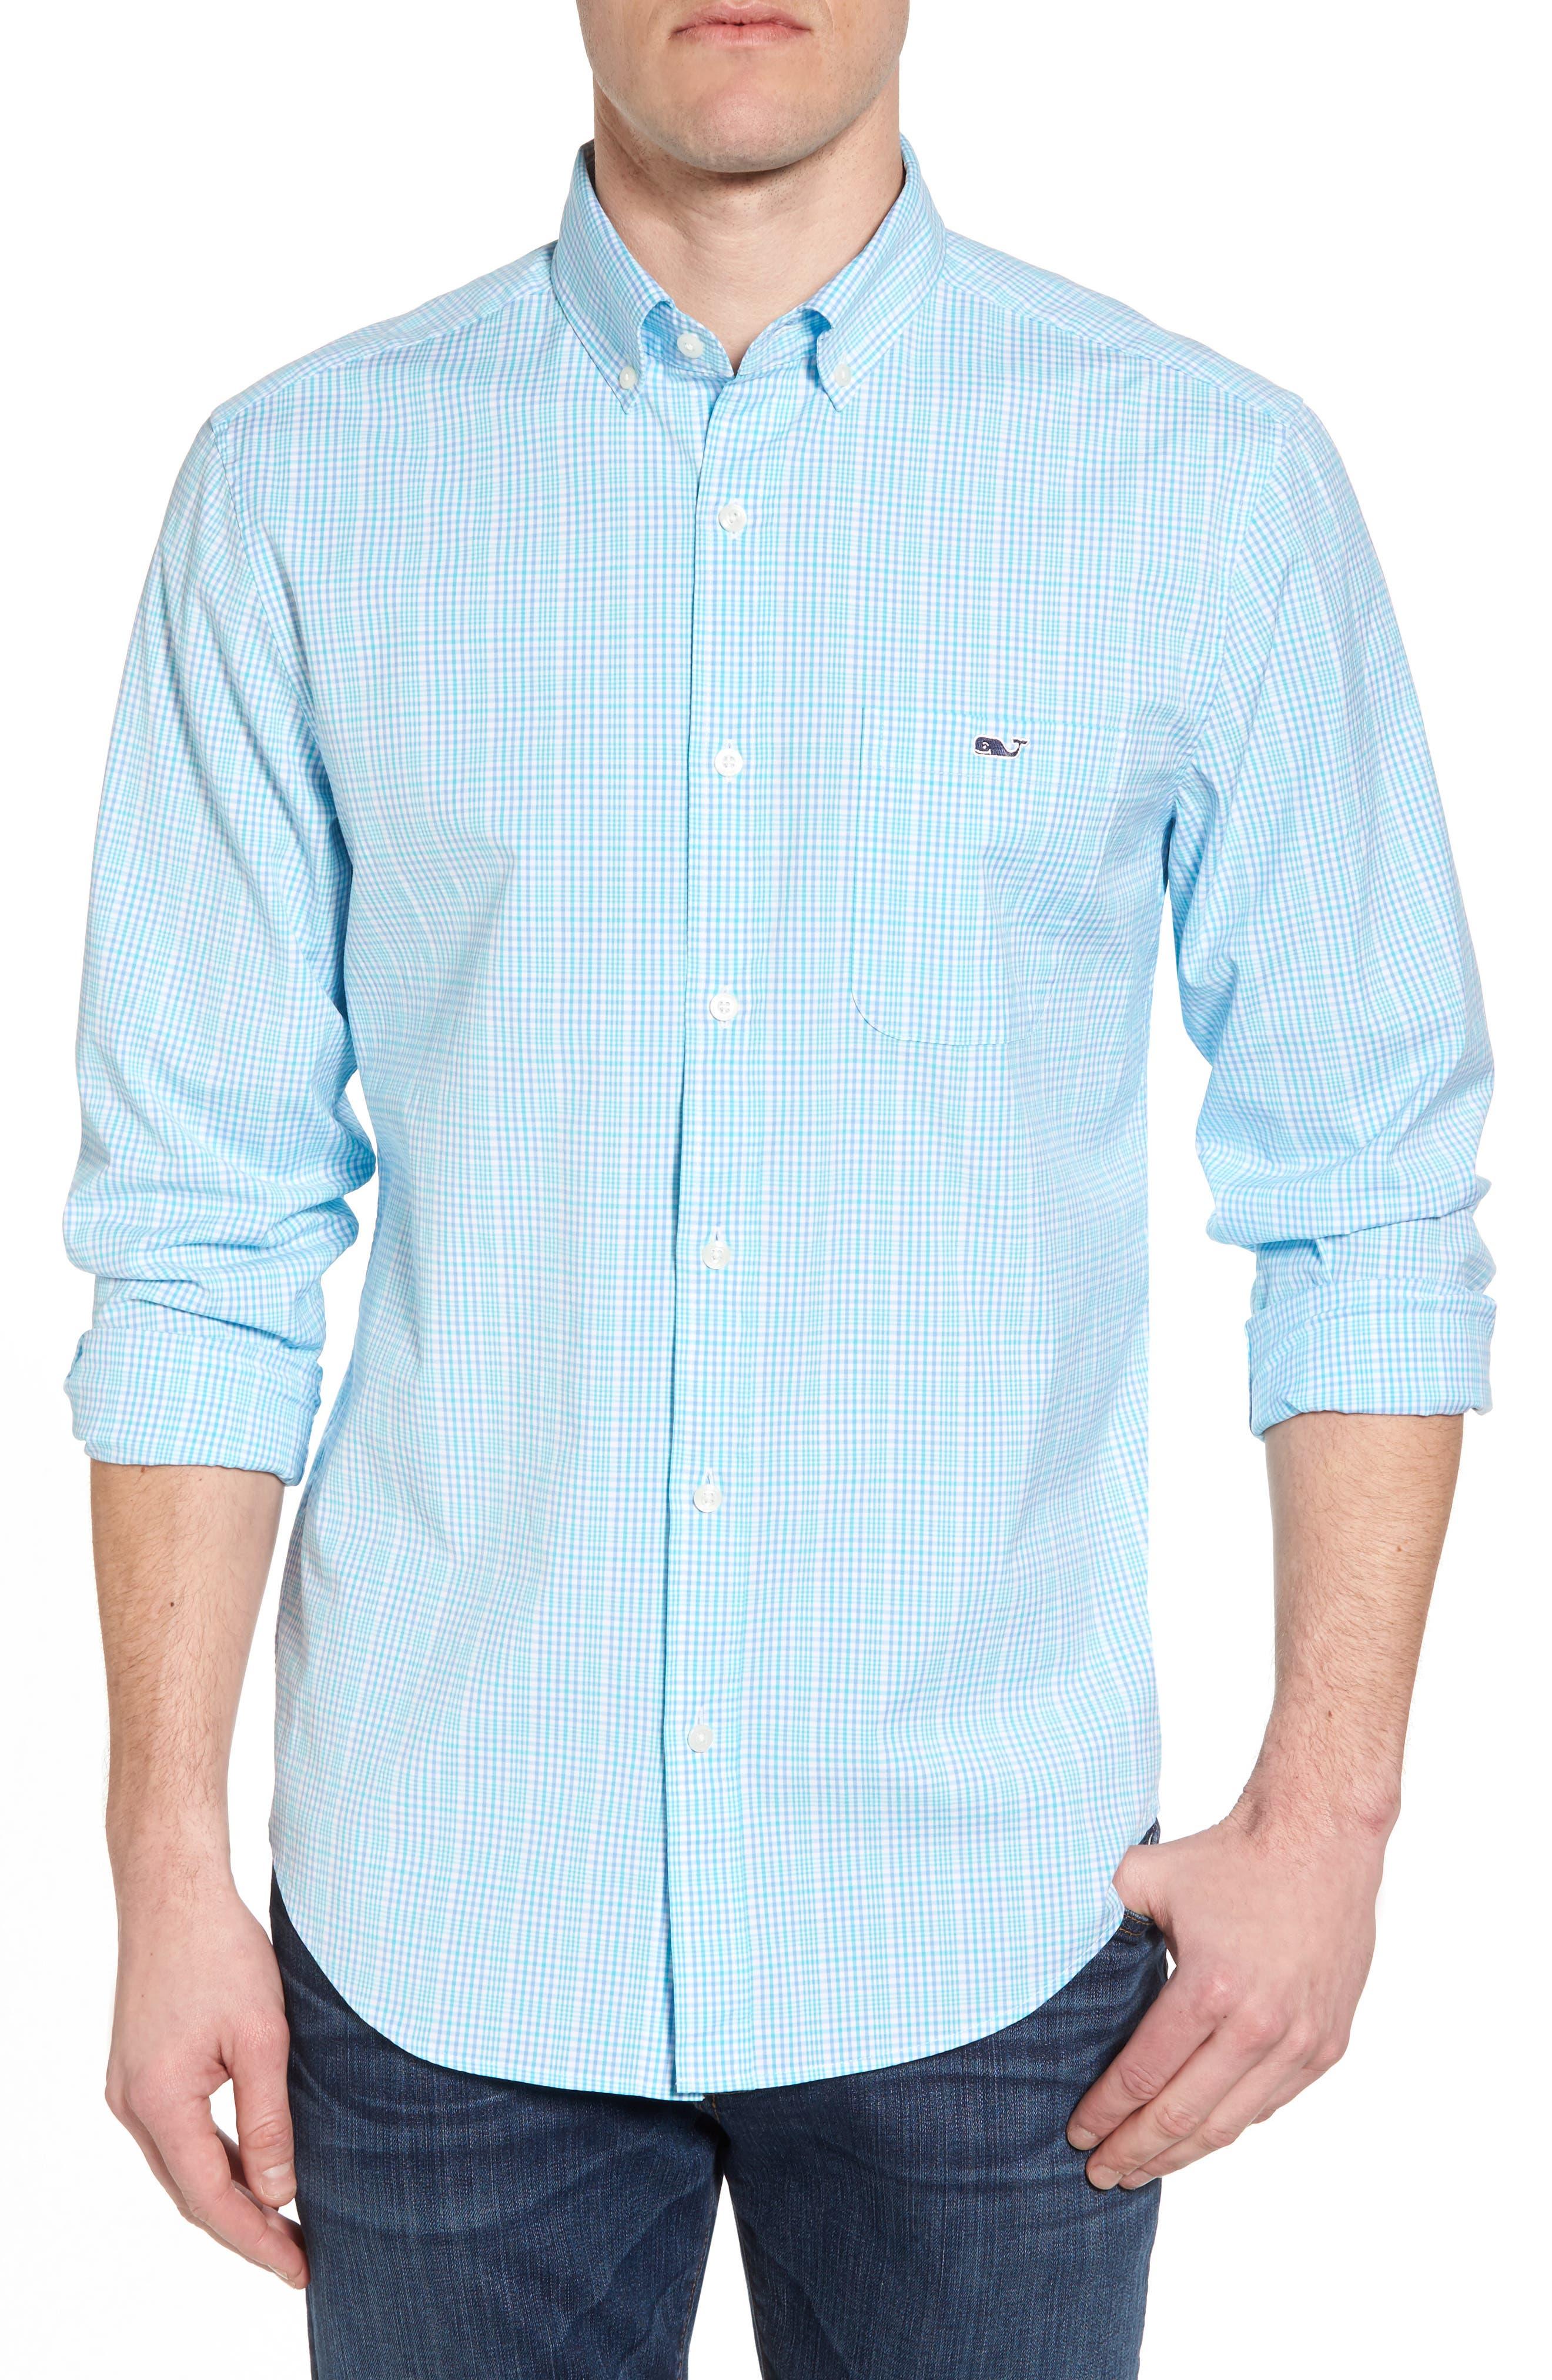 Rolling Harbor Classic Fit Plaid Sport Shirt,                         Main,                         color, Turquoise